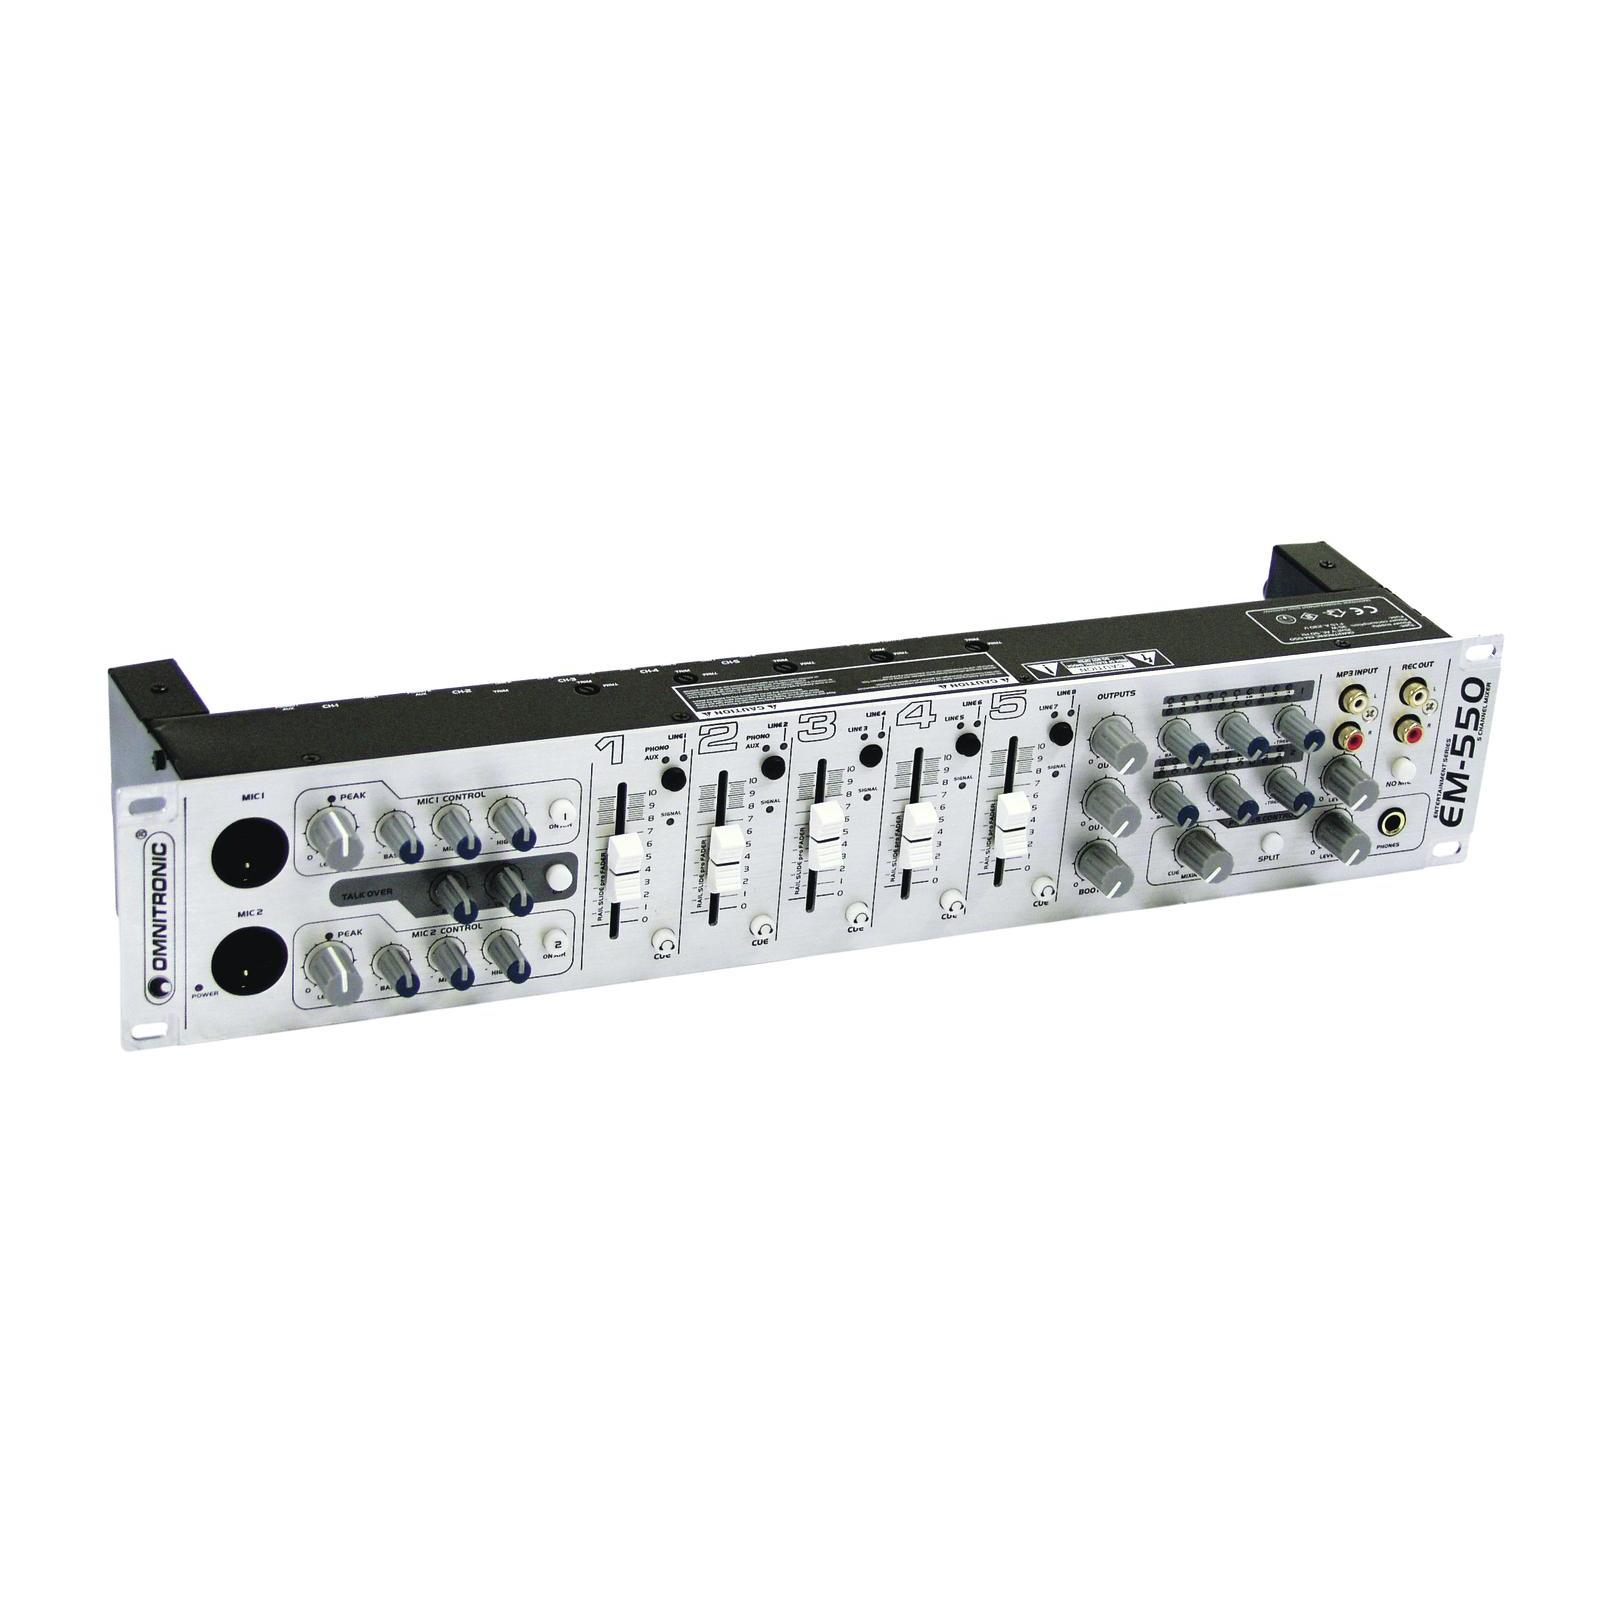 OMNITRONIC EM-550 Entertainment Mixer